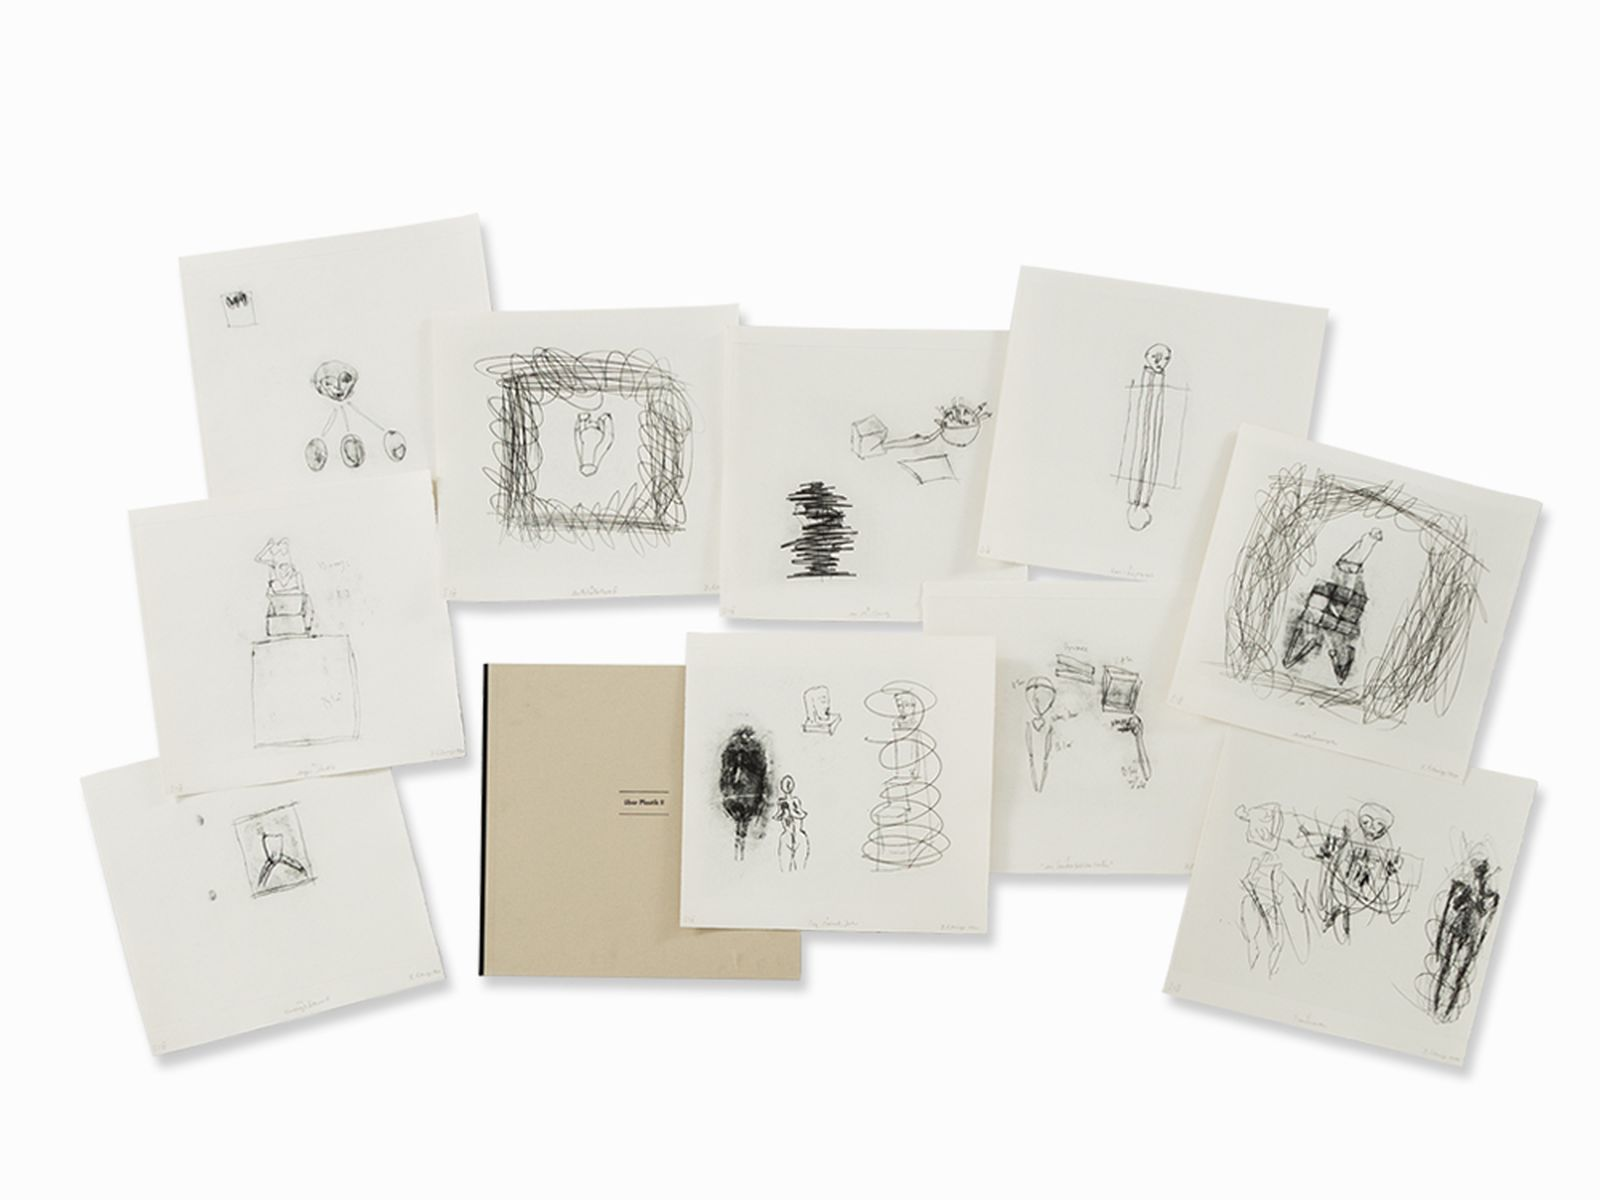 #98 Dietrich Klinge, über Plastik I, 10 Etchings, 1991 | Dietrich Klinge (geb. 1954) , über Plastik II, 10 Radierungen, 1991 Image